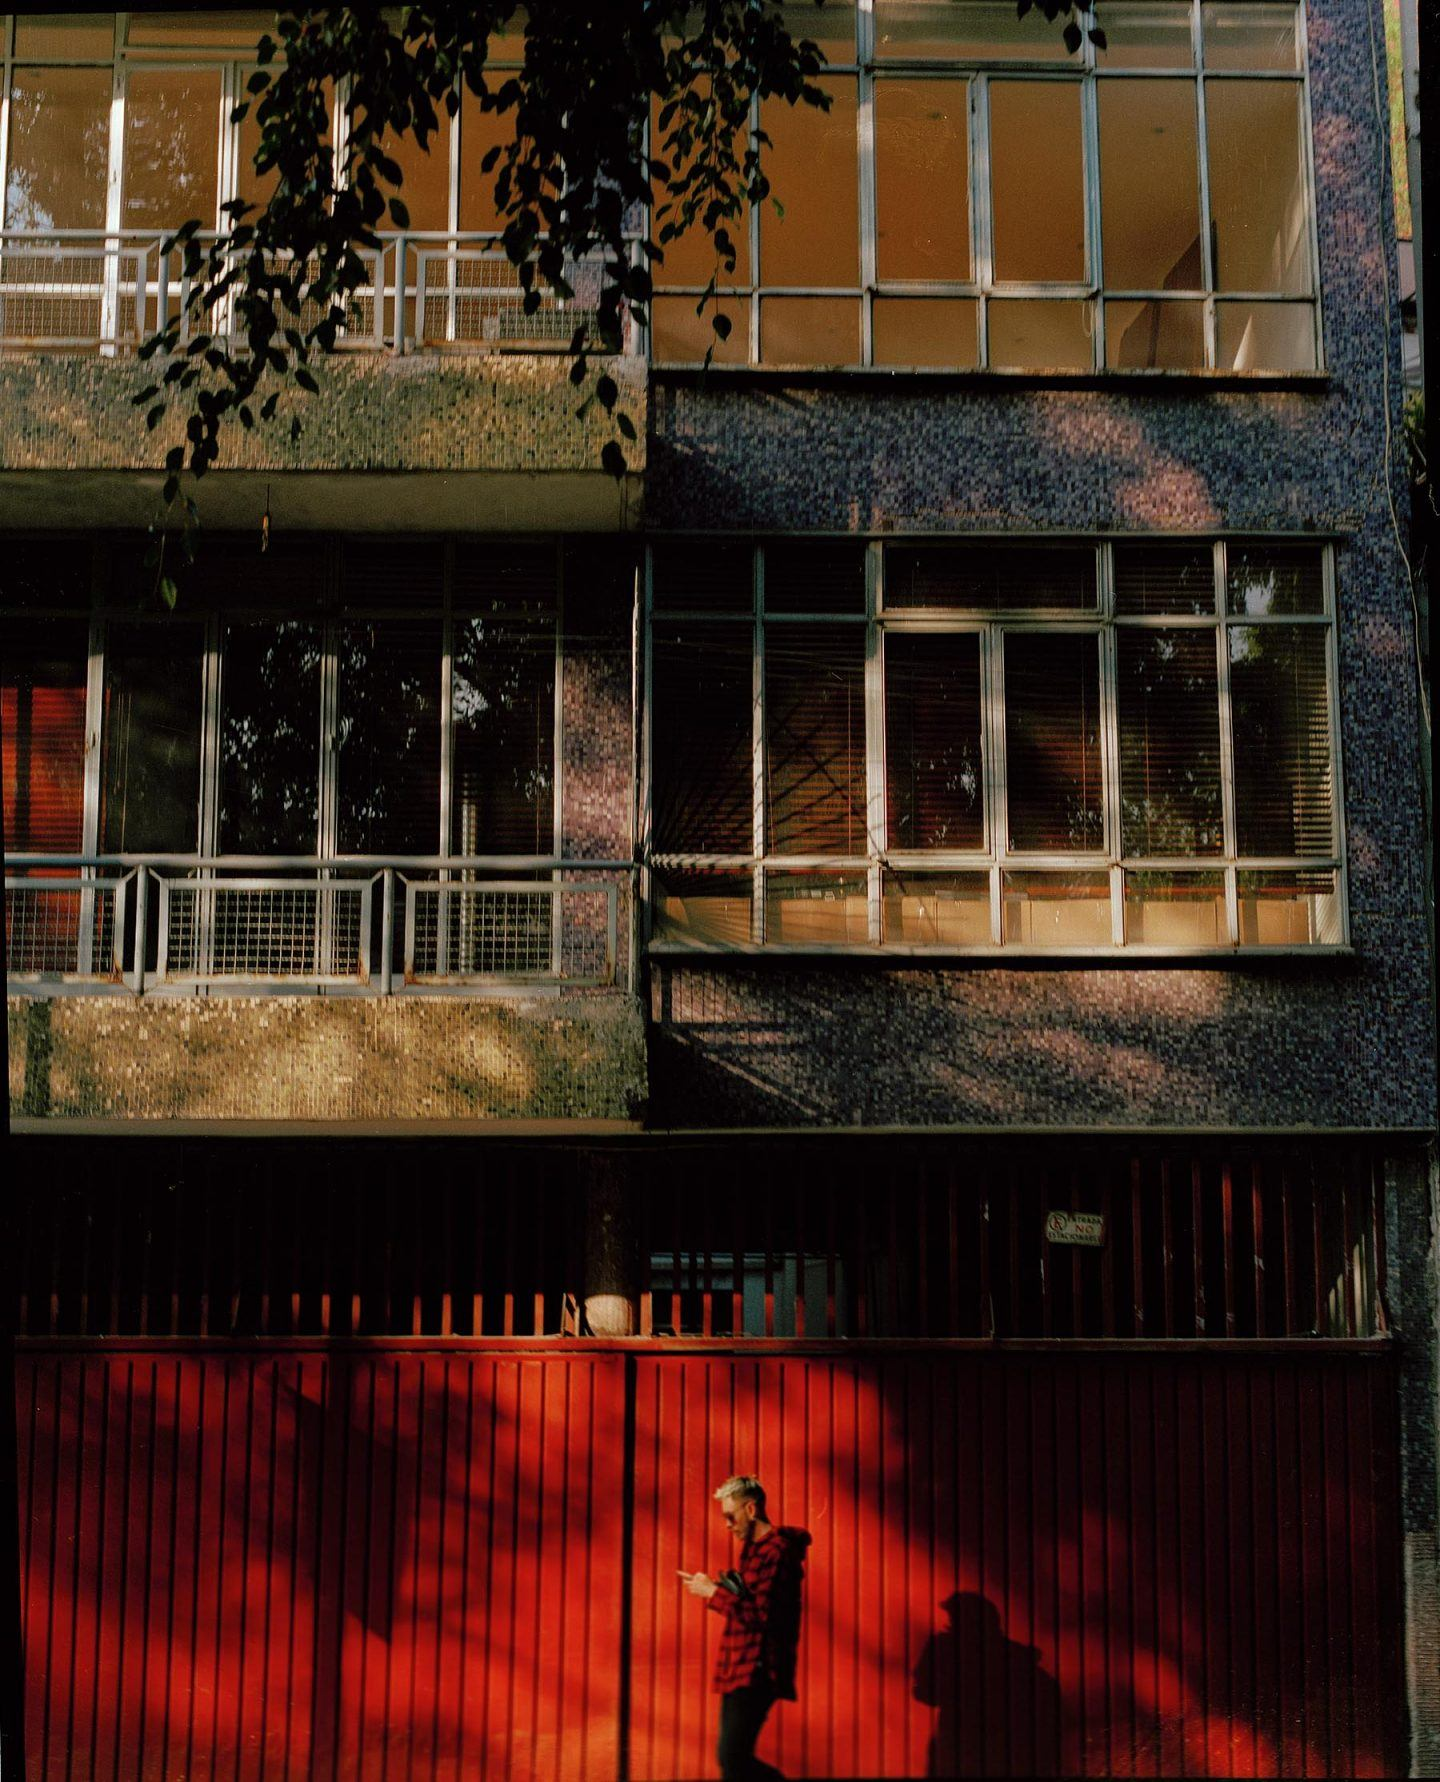 IGNANT-Photography-Joe-Perri-Mexico-29